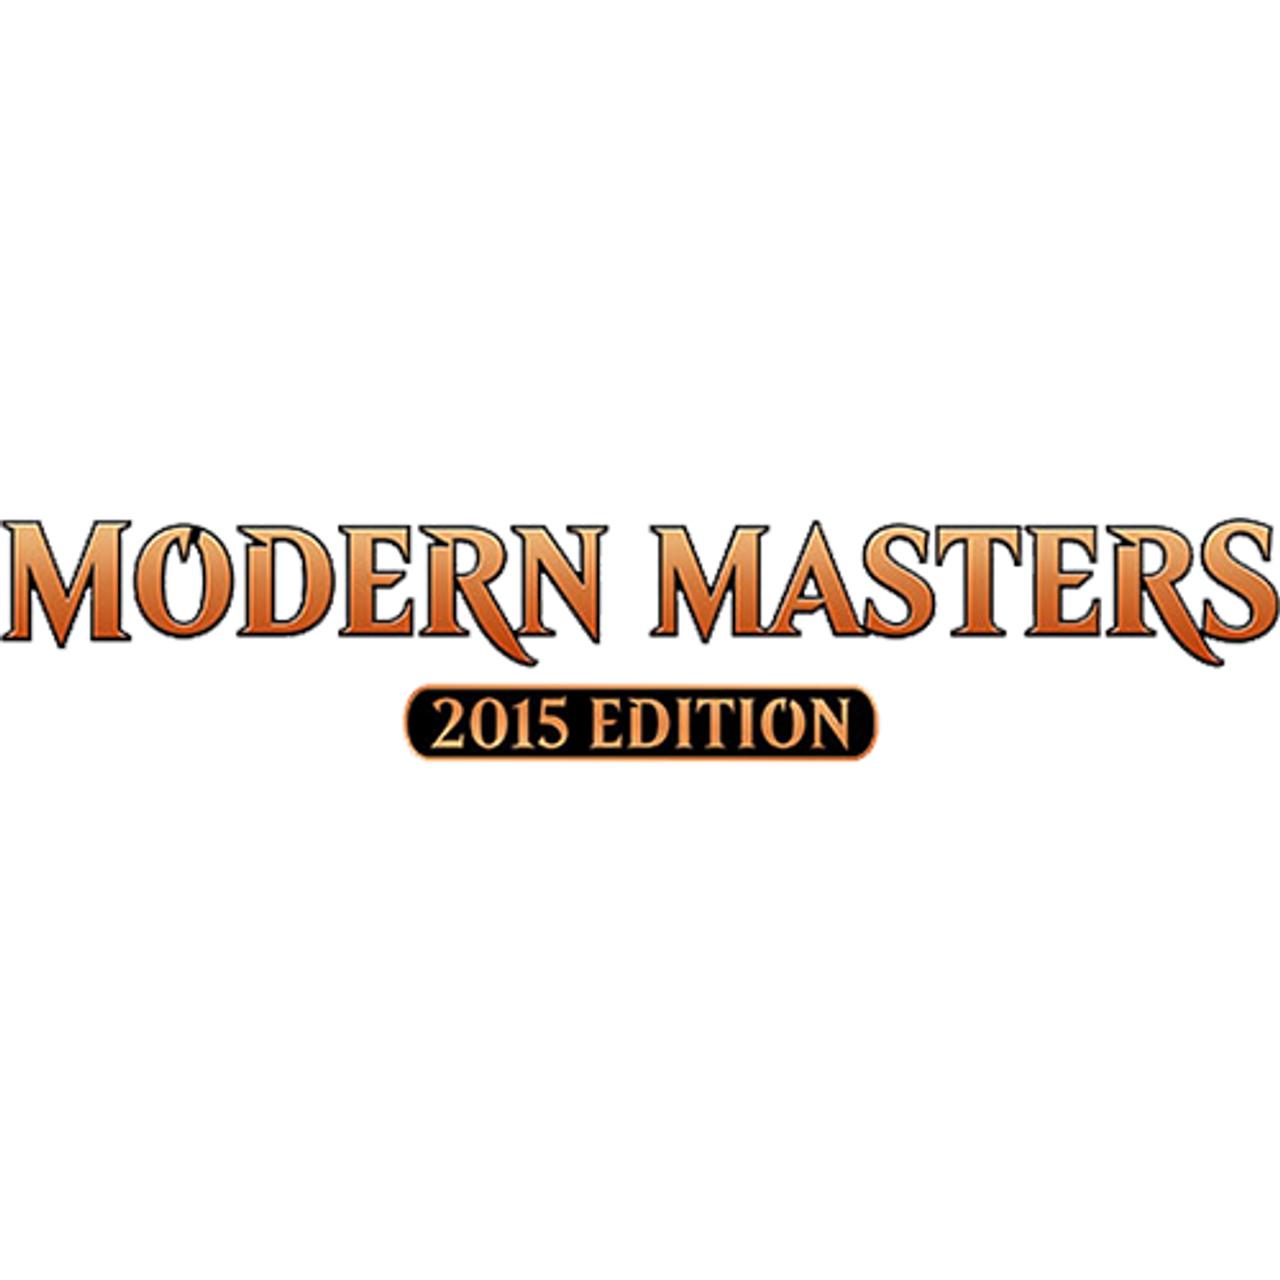 Modern Masters 2015